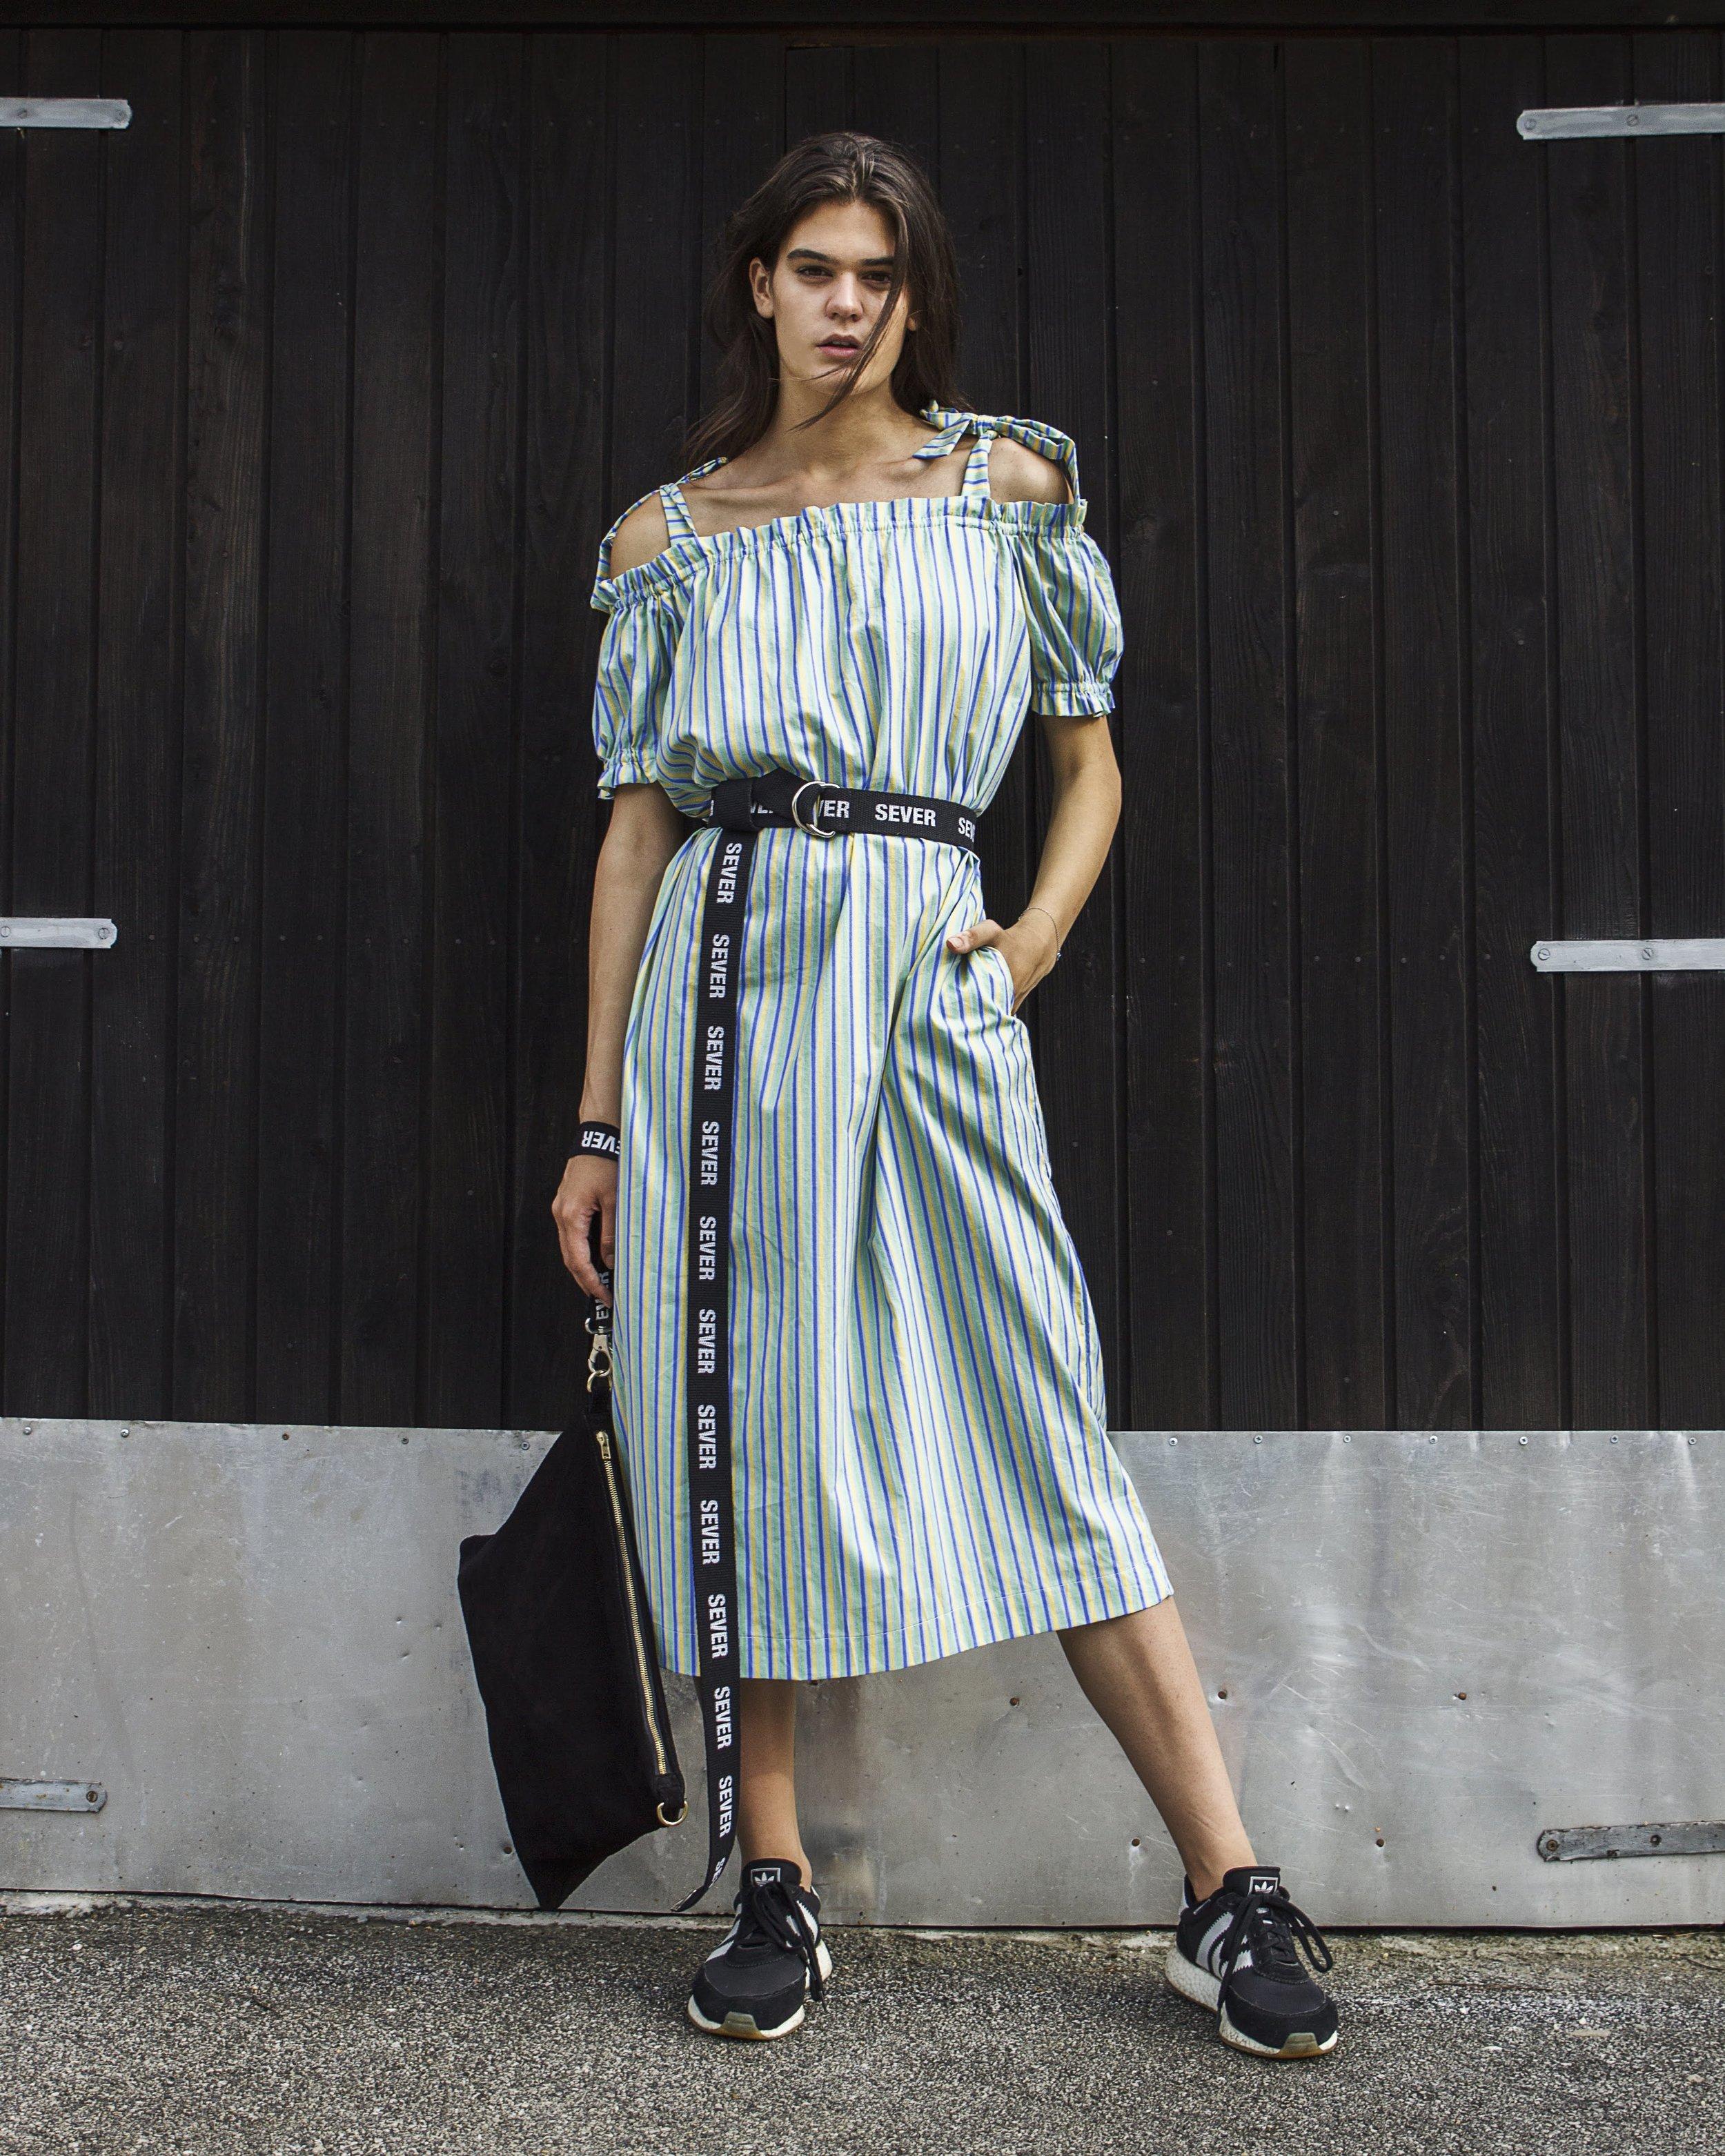 luka-lajic-fashion-photography-robert-sever-dizajner (10).jpg